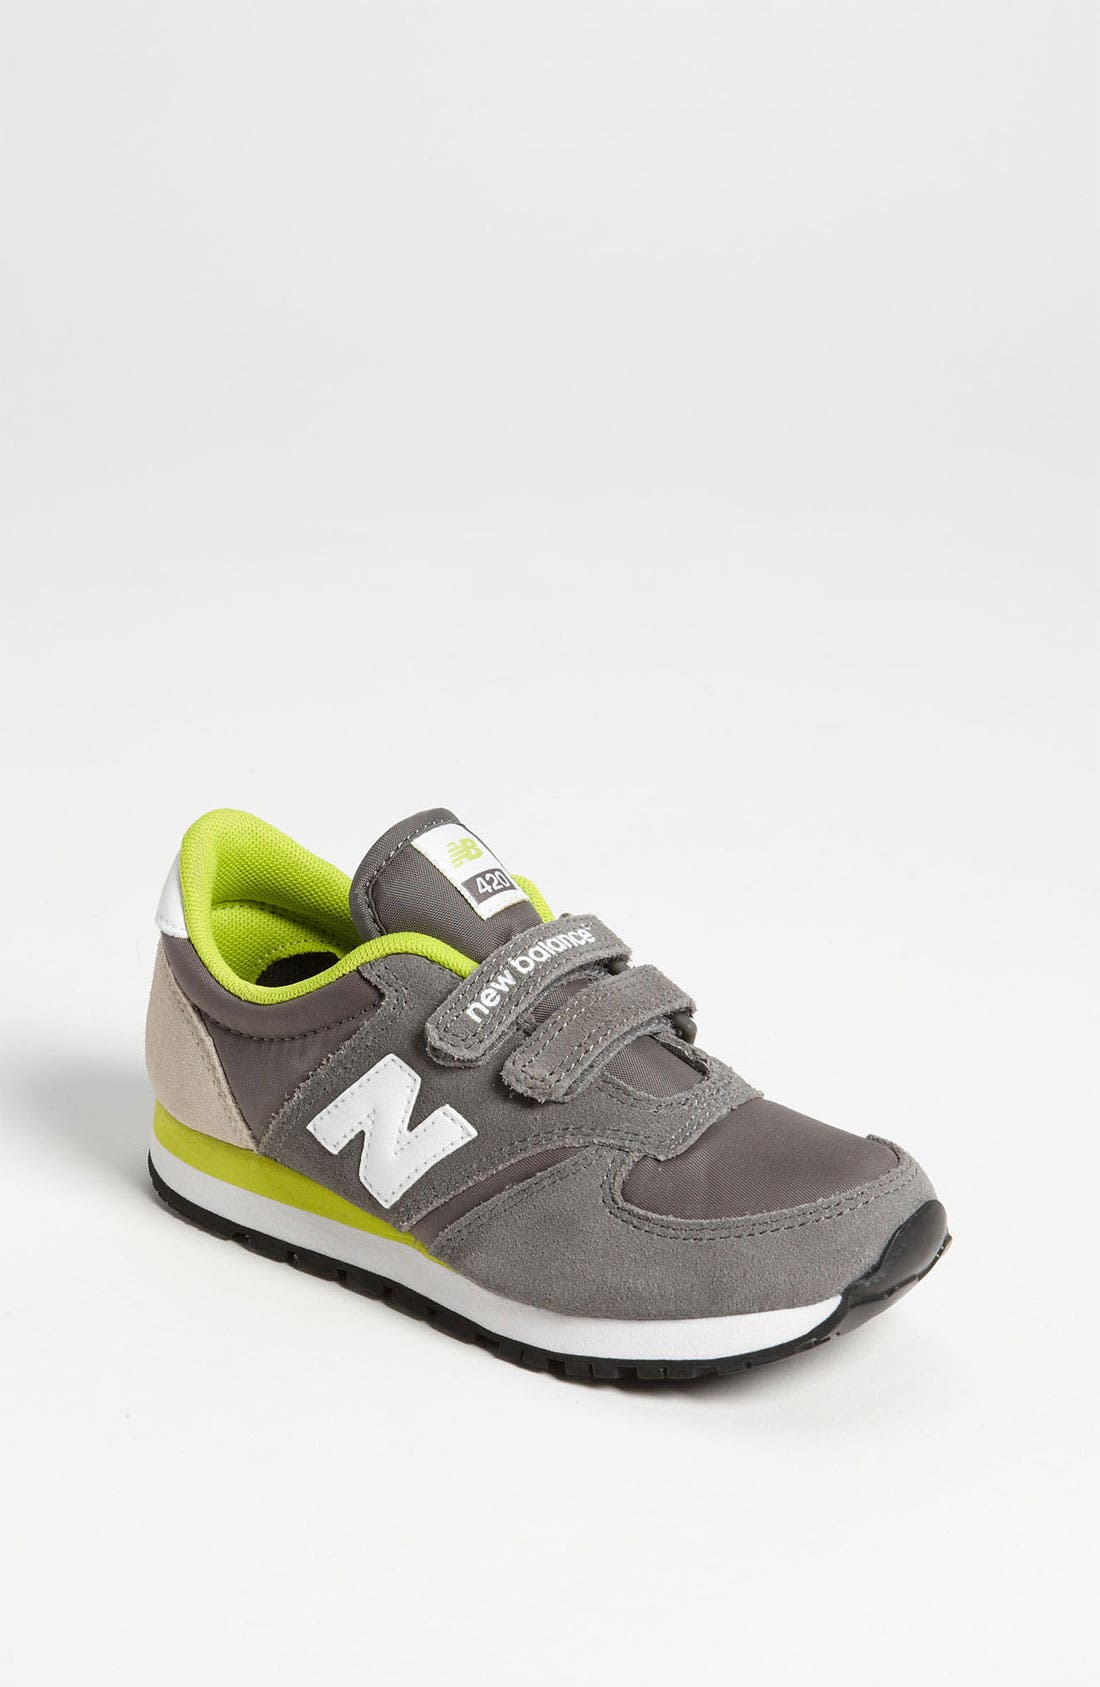 Alternate Image 1 Selected - New Balance '420 Take Down' Sneaker (Toddler, Little Kid & Big Kid)